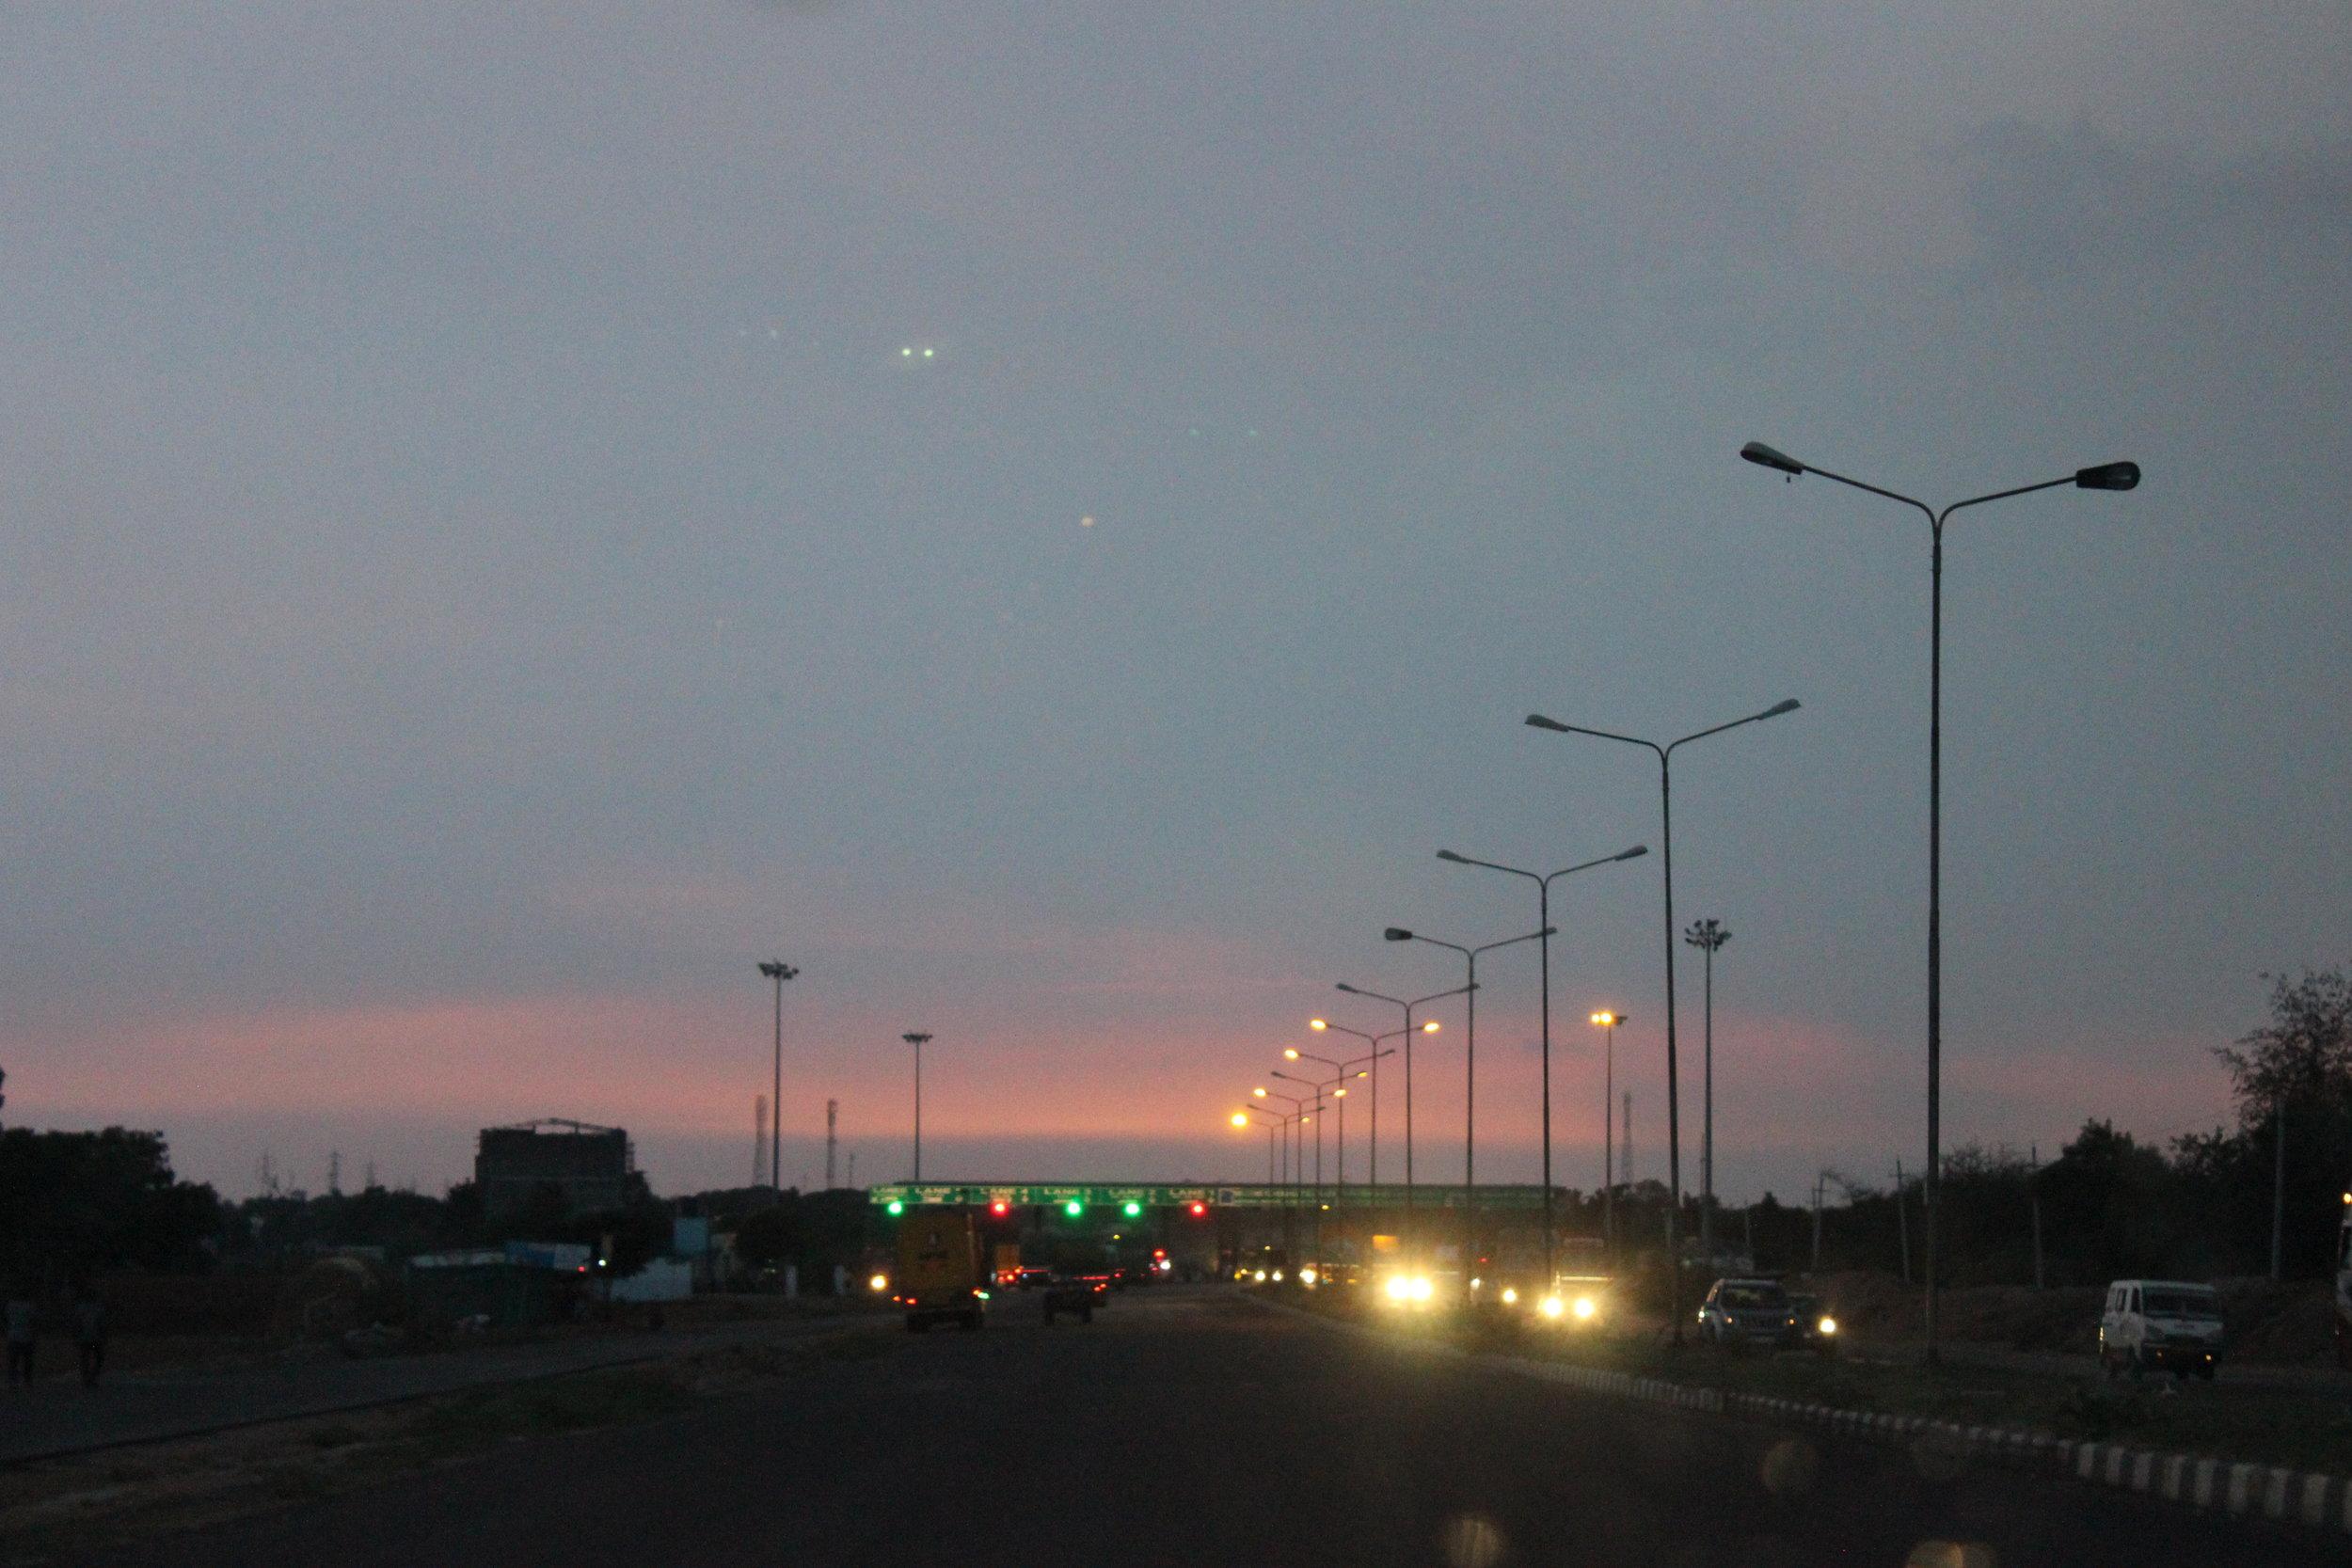 Day 2: Sunset en-route to Davangere